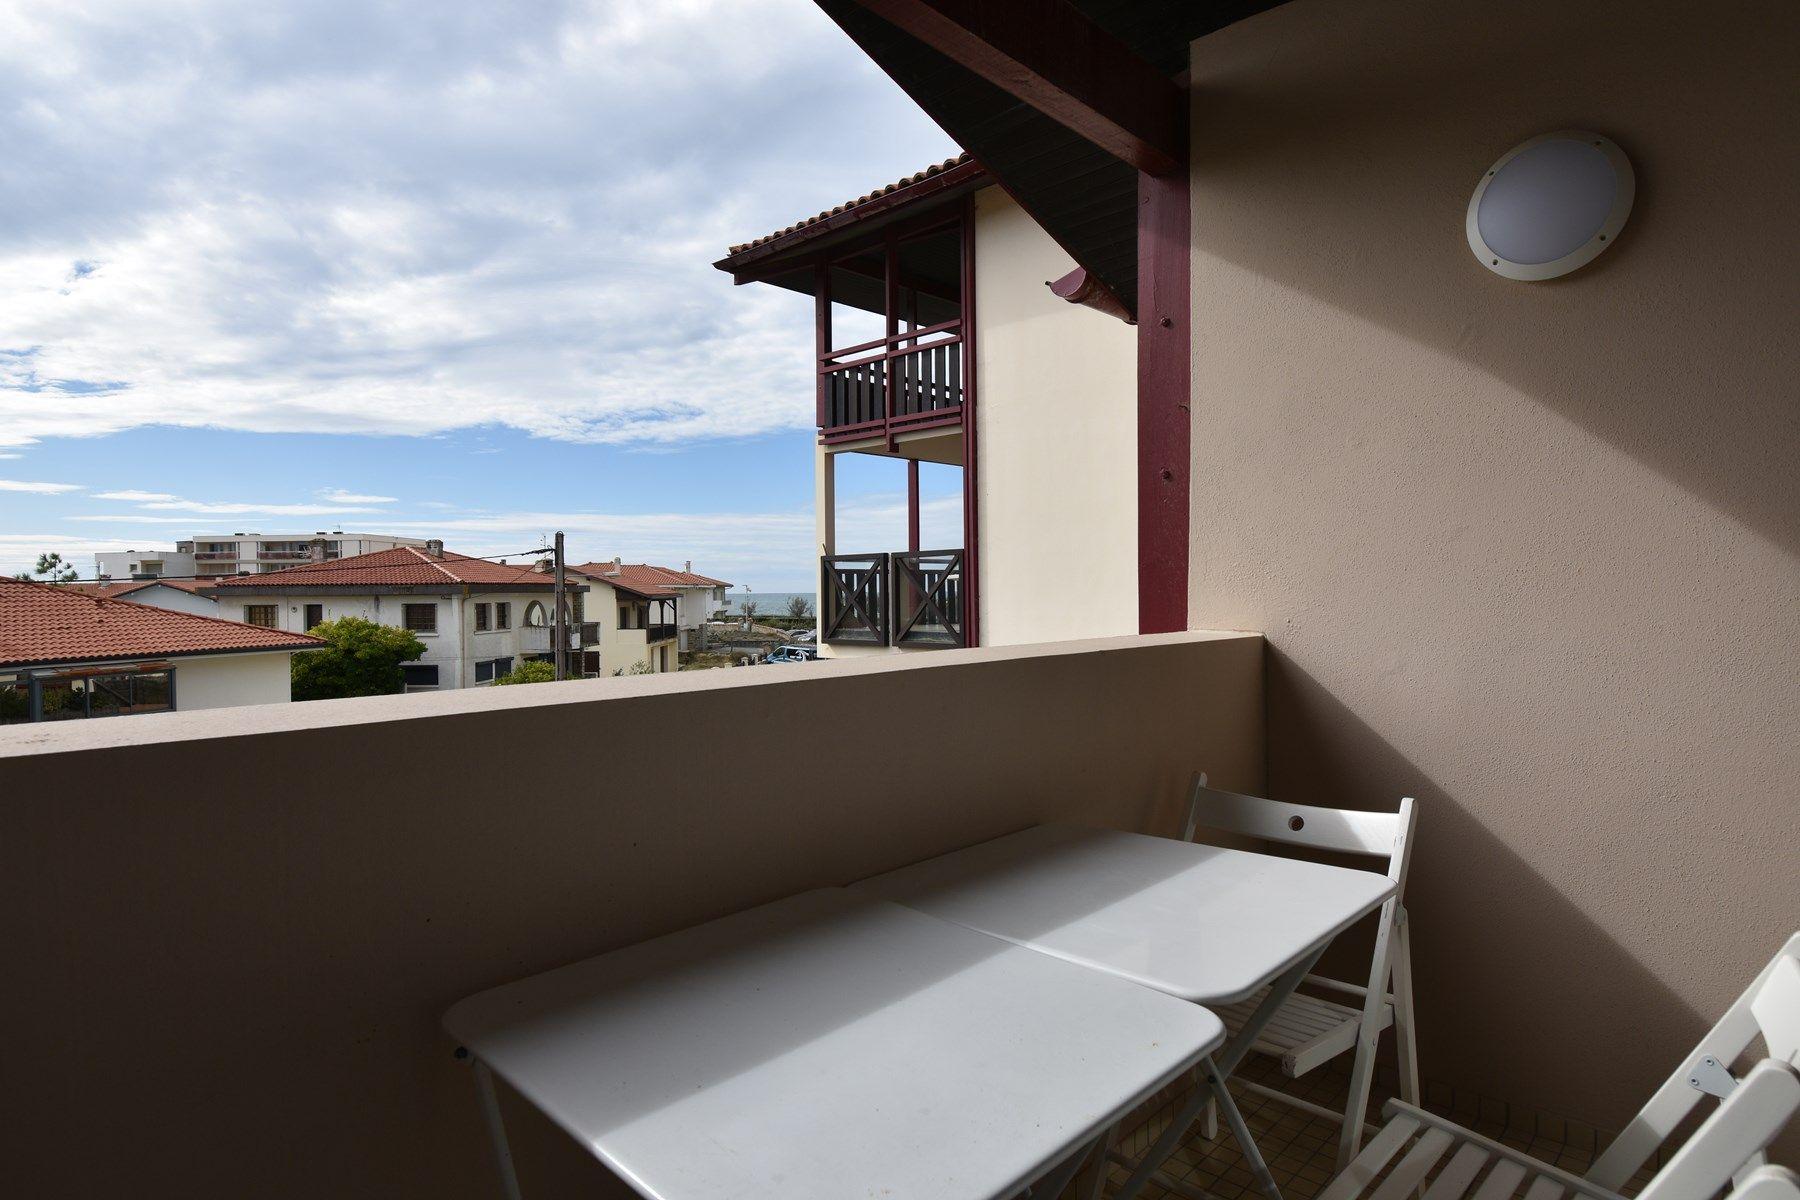 location de vacances à Hossegor ref:0631